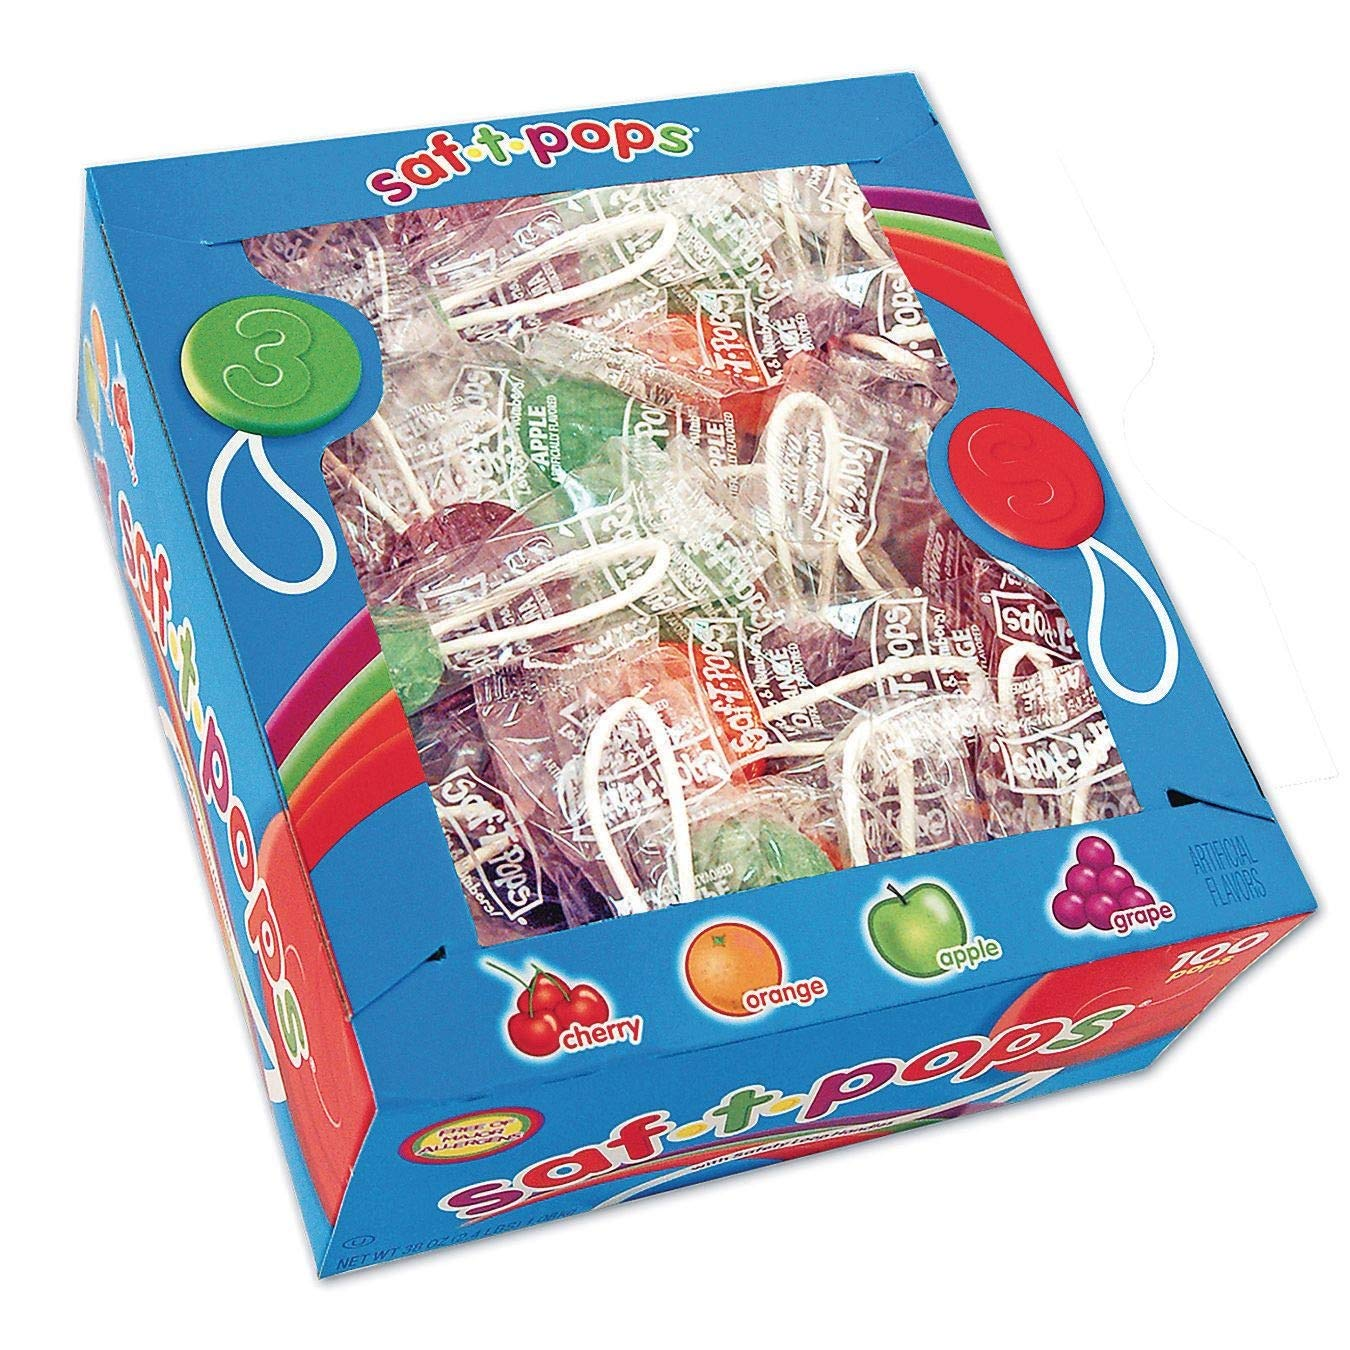 Saf-T-Pops 100 ct box - assorted flavors by Saf-T-Pops